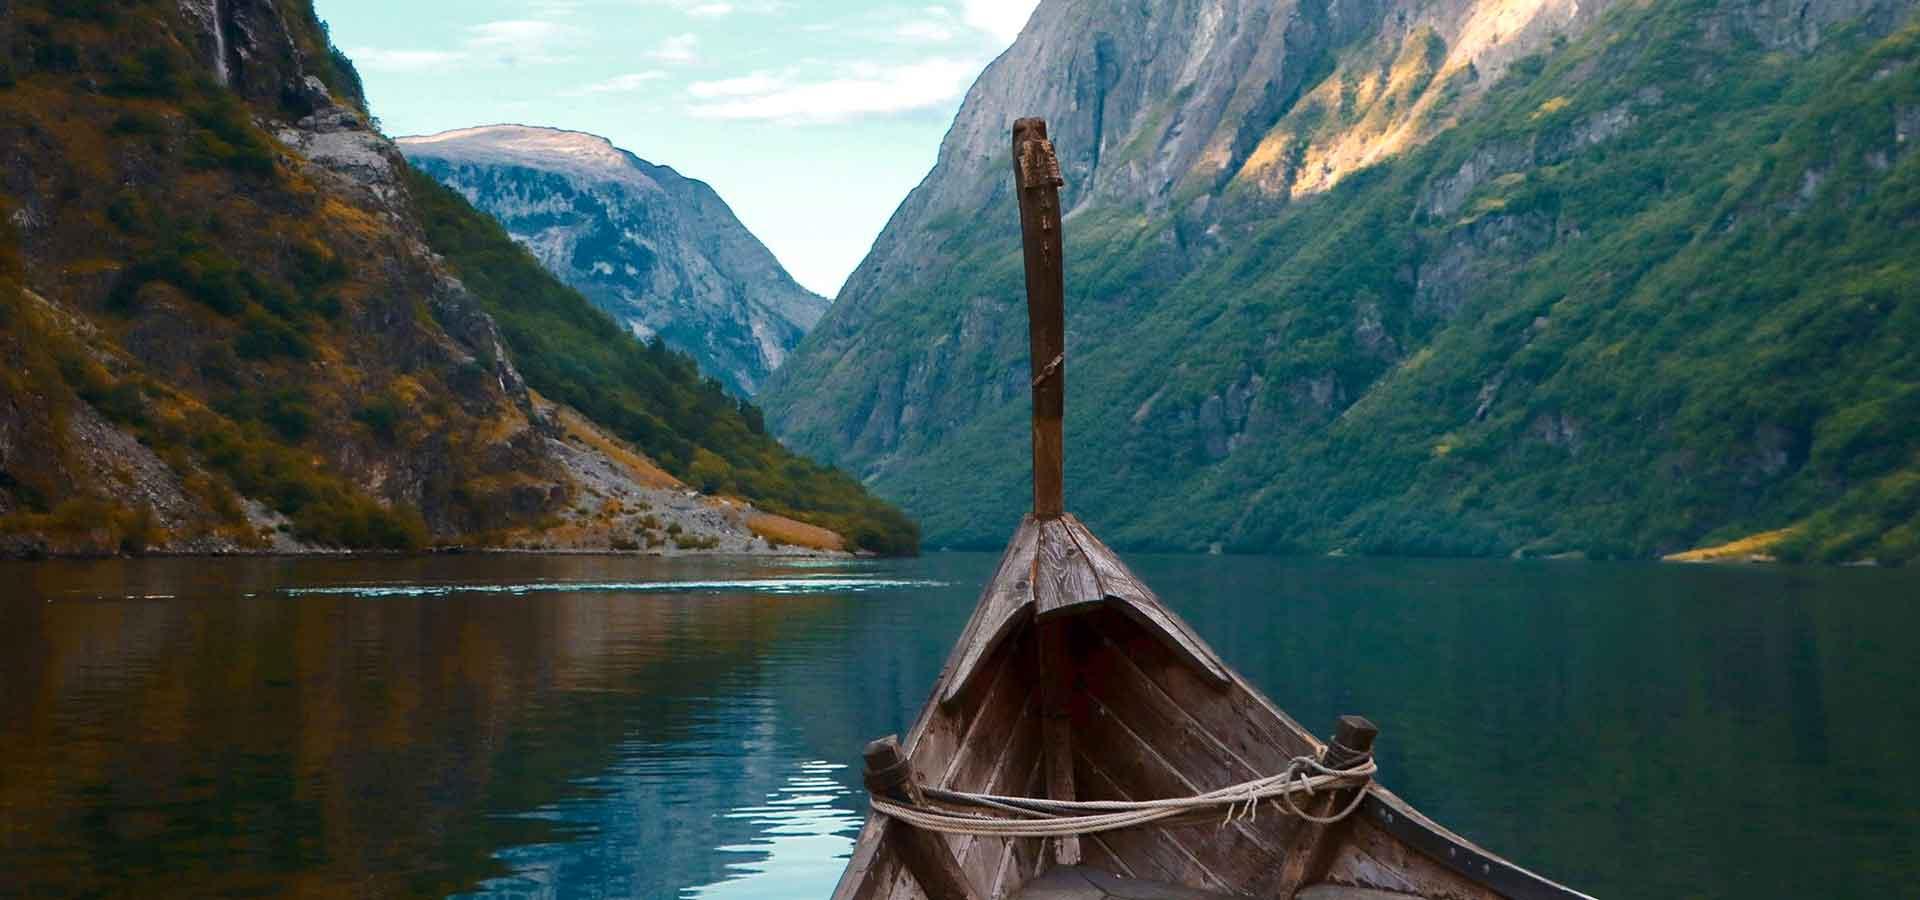 Voyages-Traditours-Scandinavie-Vikings-fjords